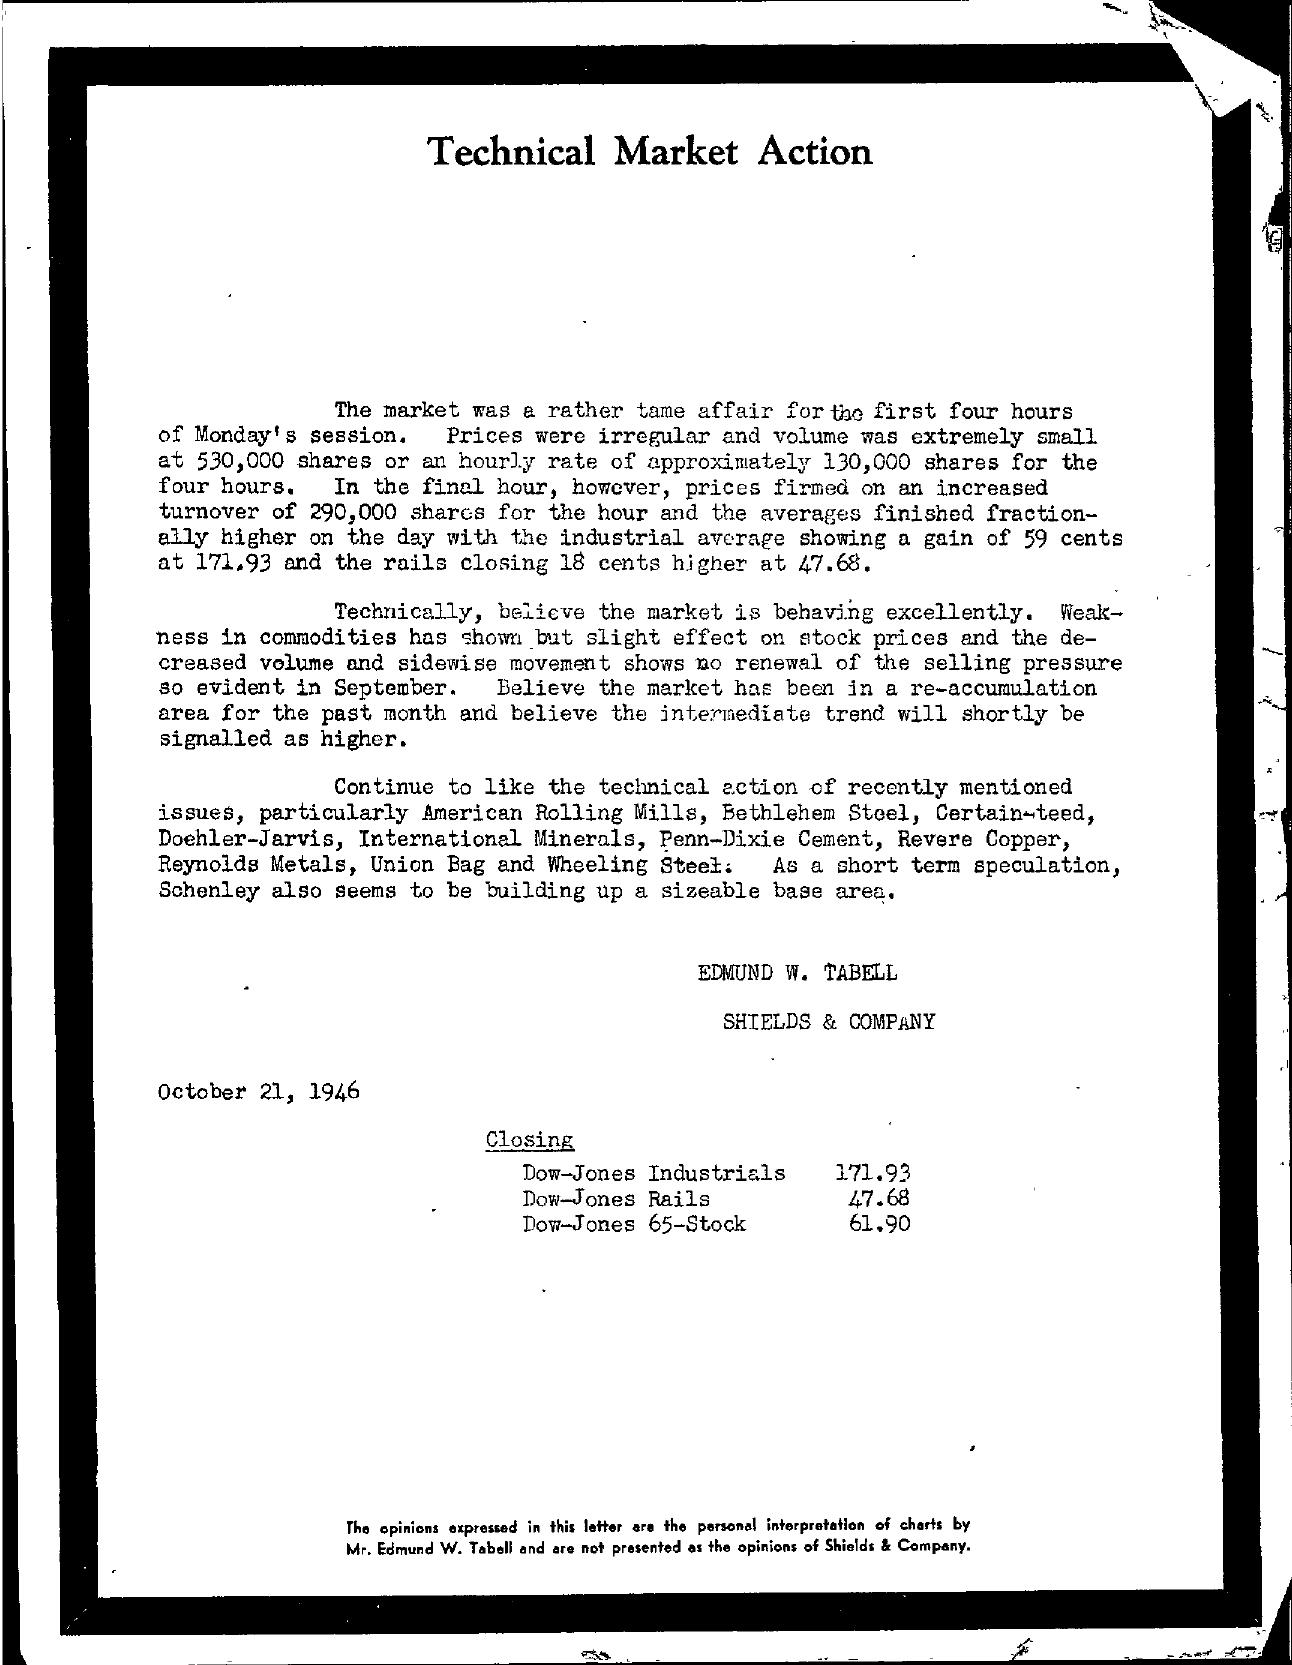 Tabell's Market Letter - October 21, 1946